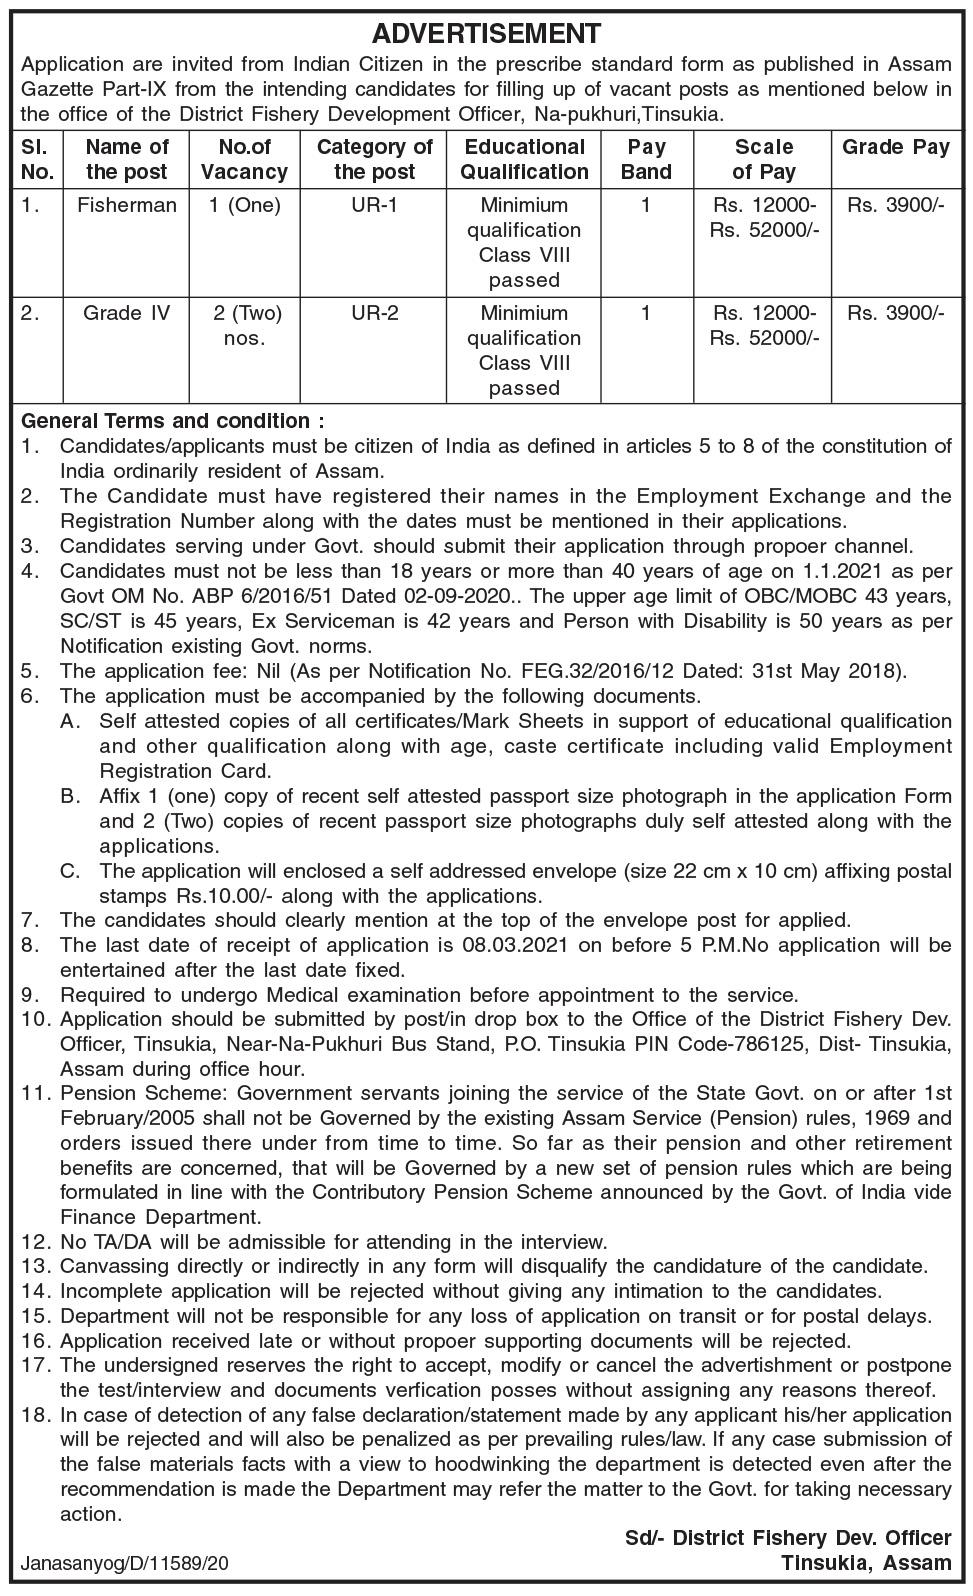 District Fishery Development Officer, Tinsukia Recruitment 2021: Apply for 03 Grade IV & Fisherman Posts